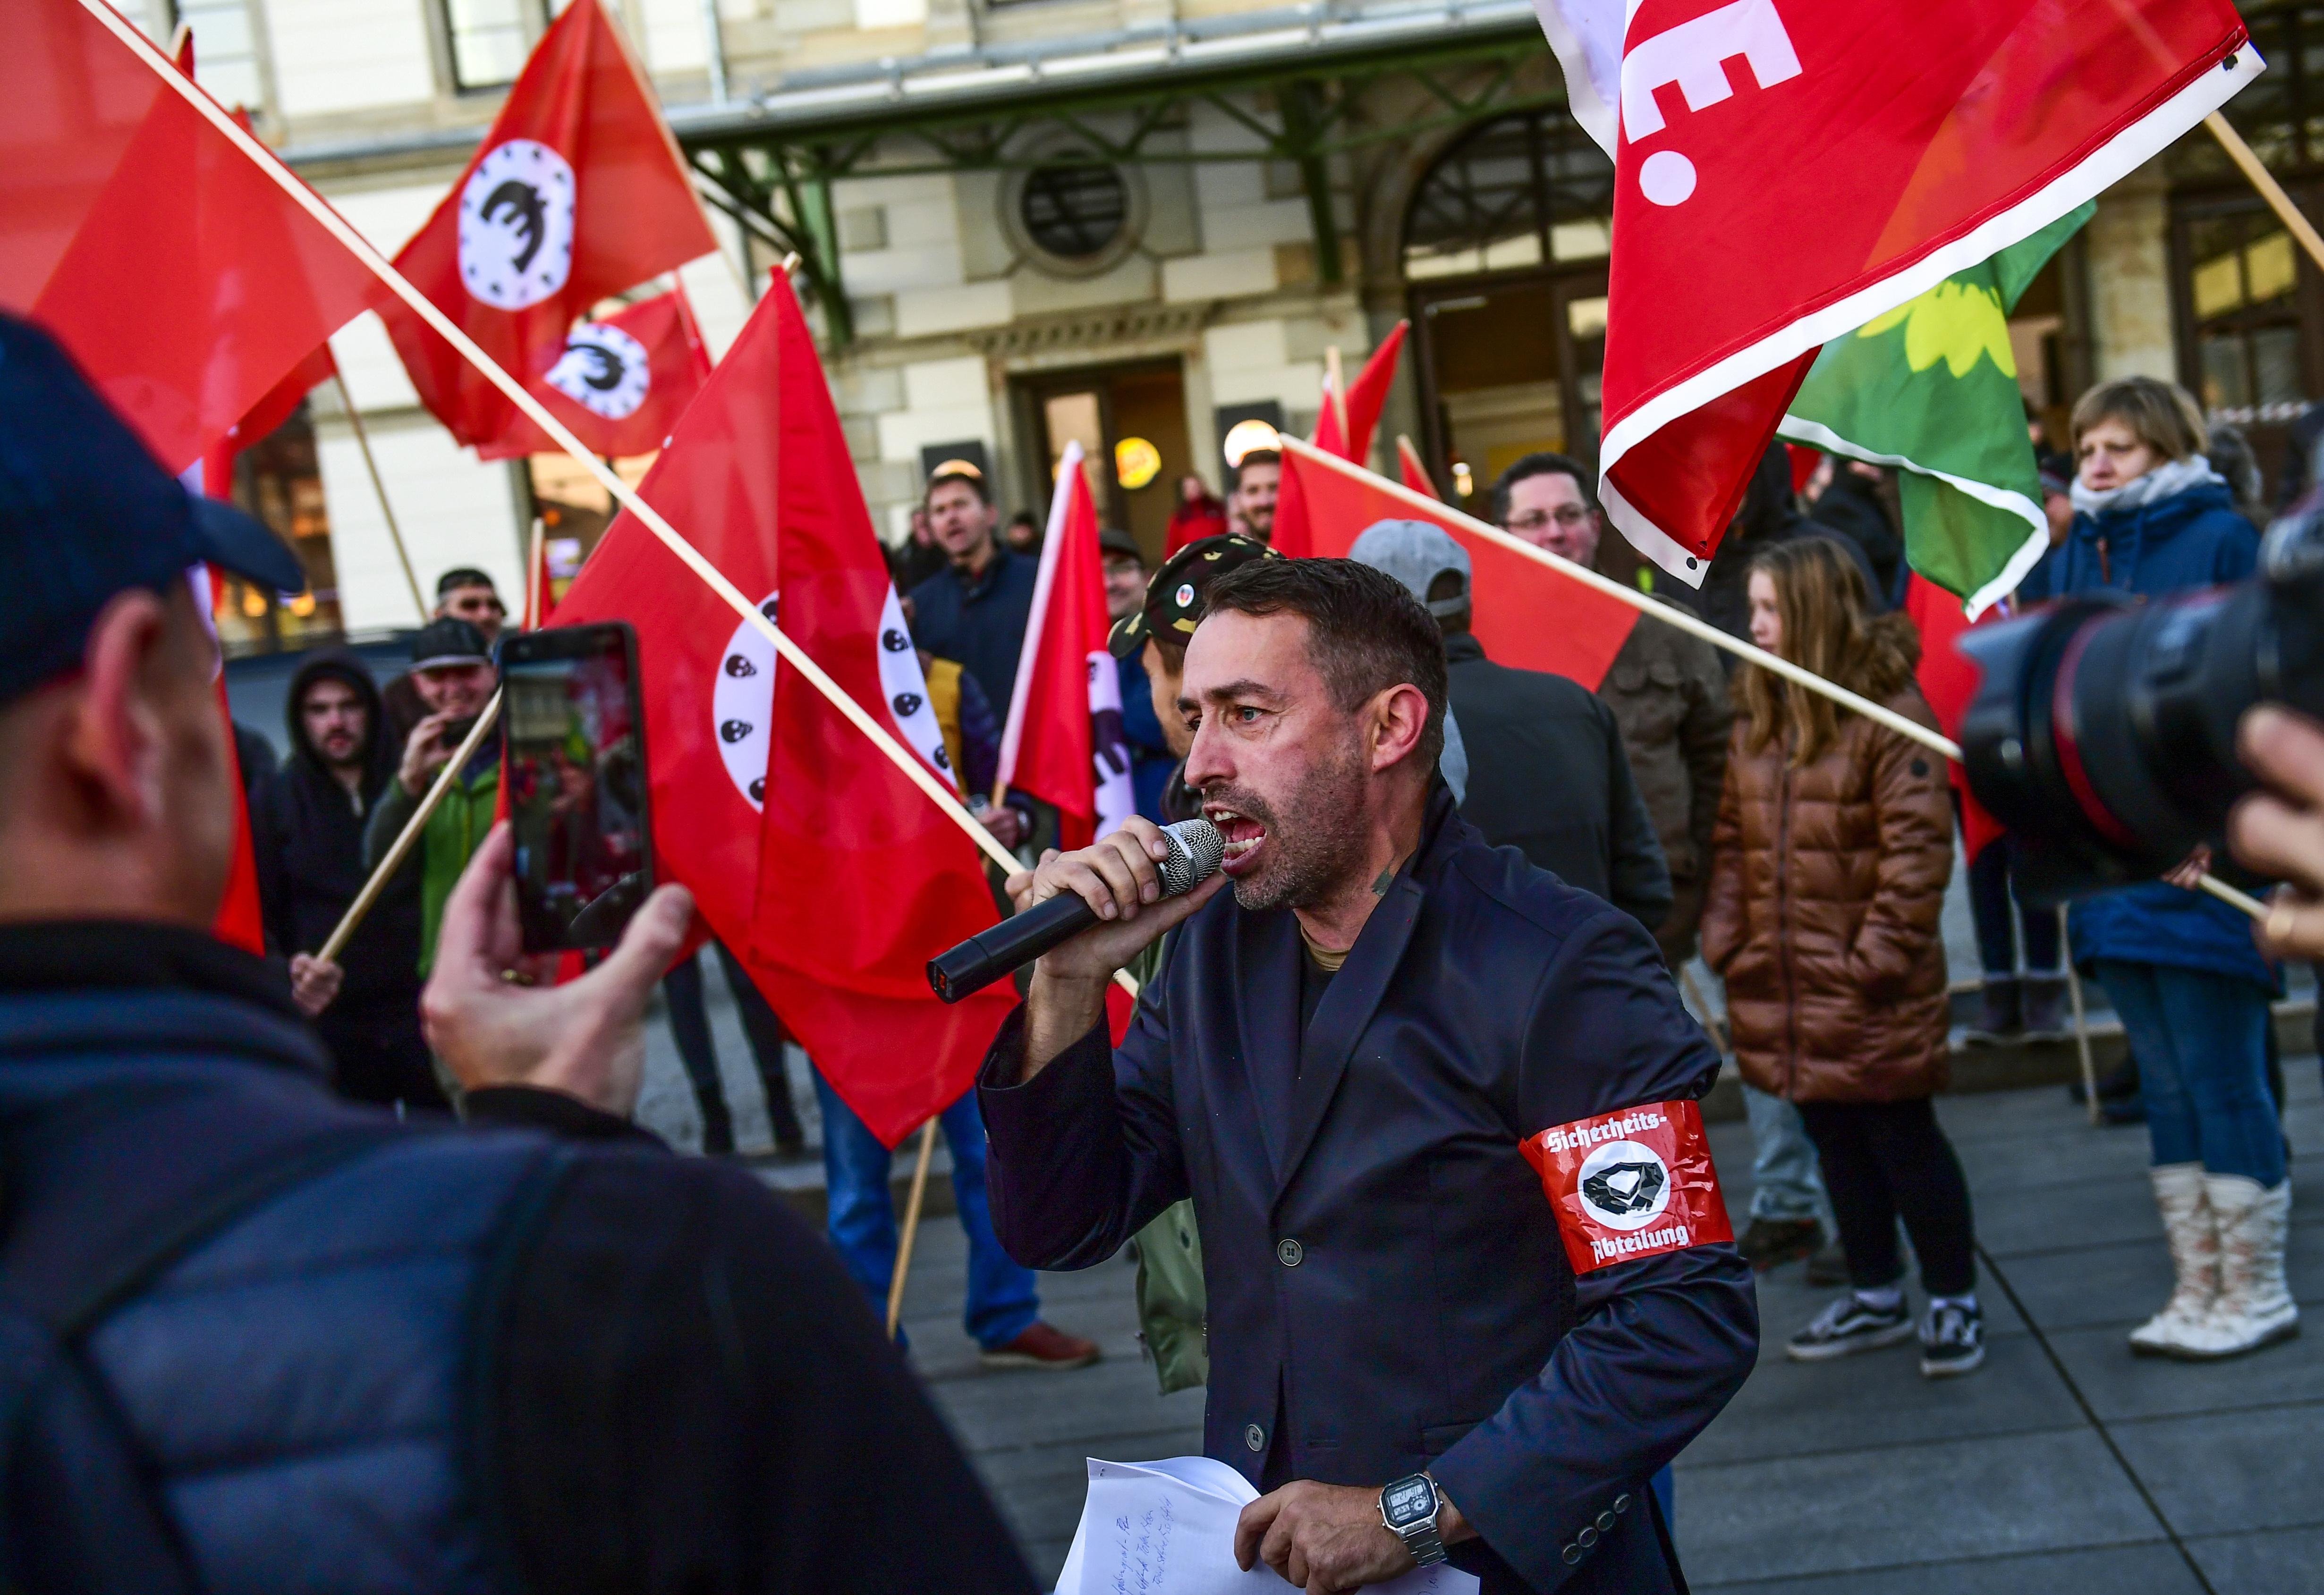 Merkel u Chemnitzu branila migrantsku politiku